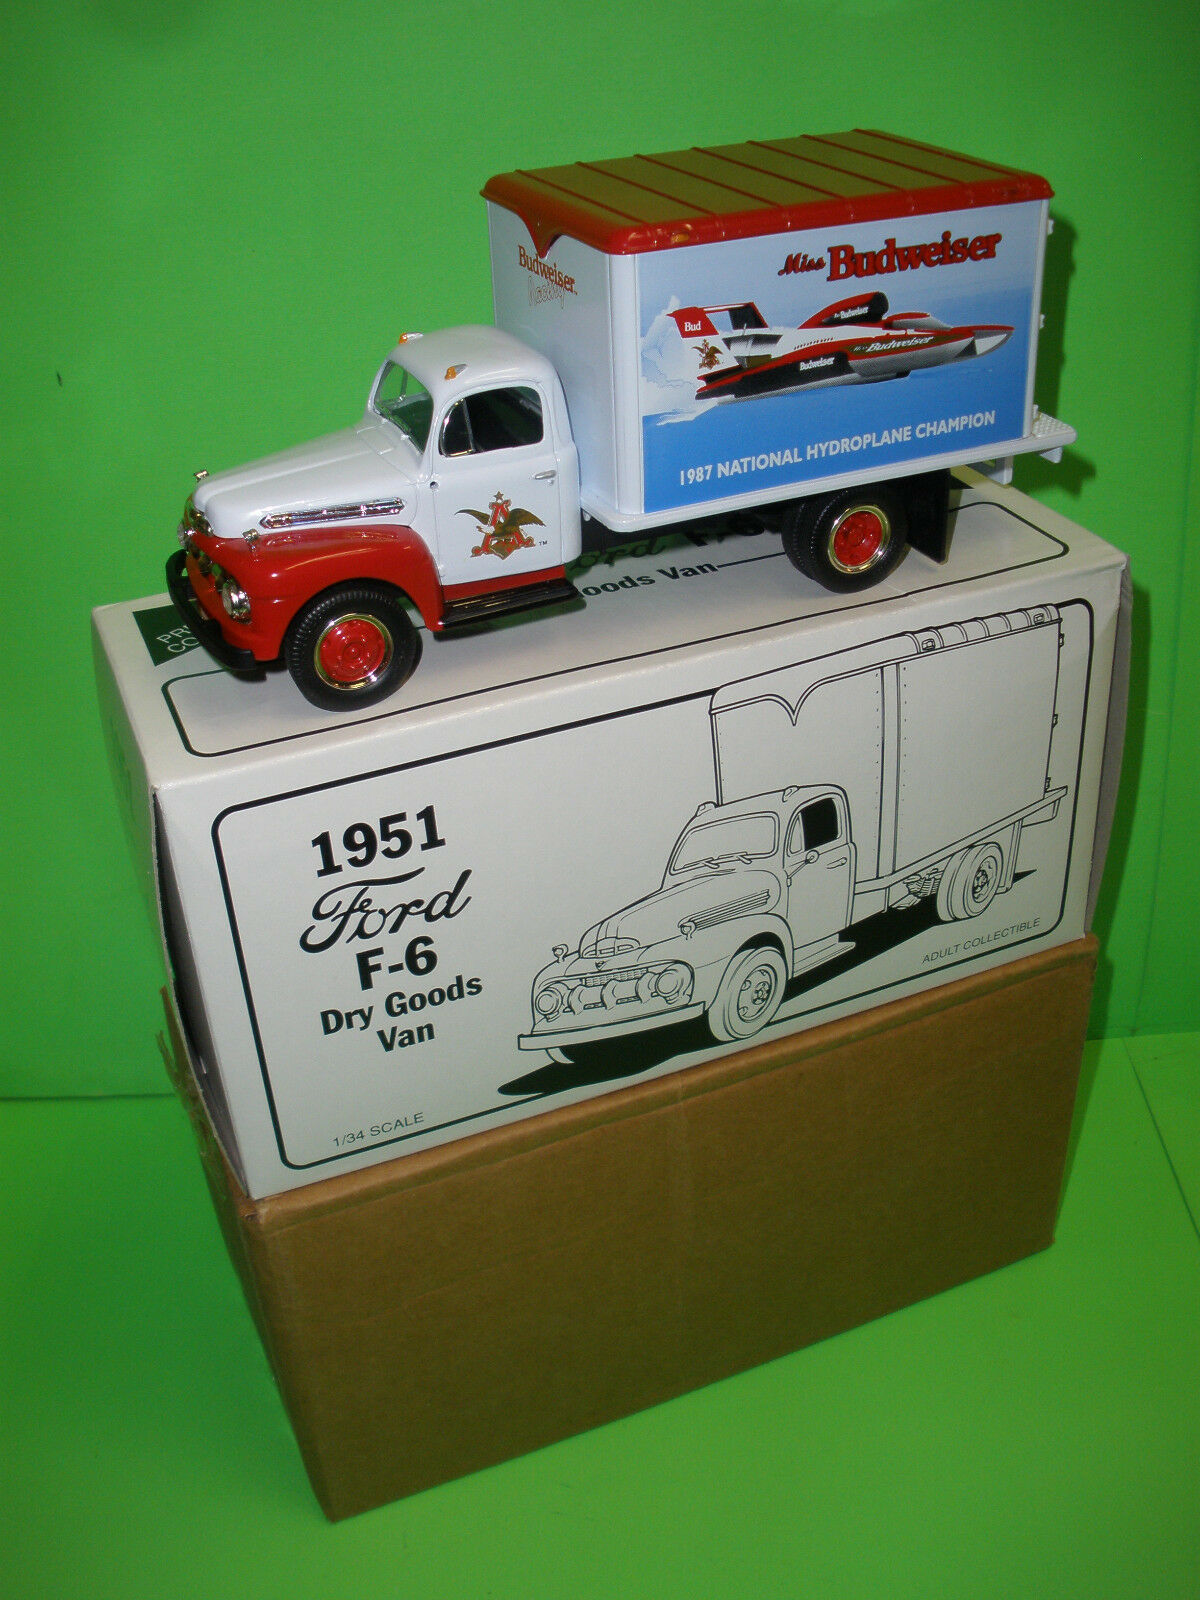 Budweiser 1951 FORD F-6 Dry Goods camion de livraison Van Replica Hydroglisseur champion